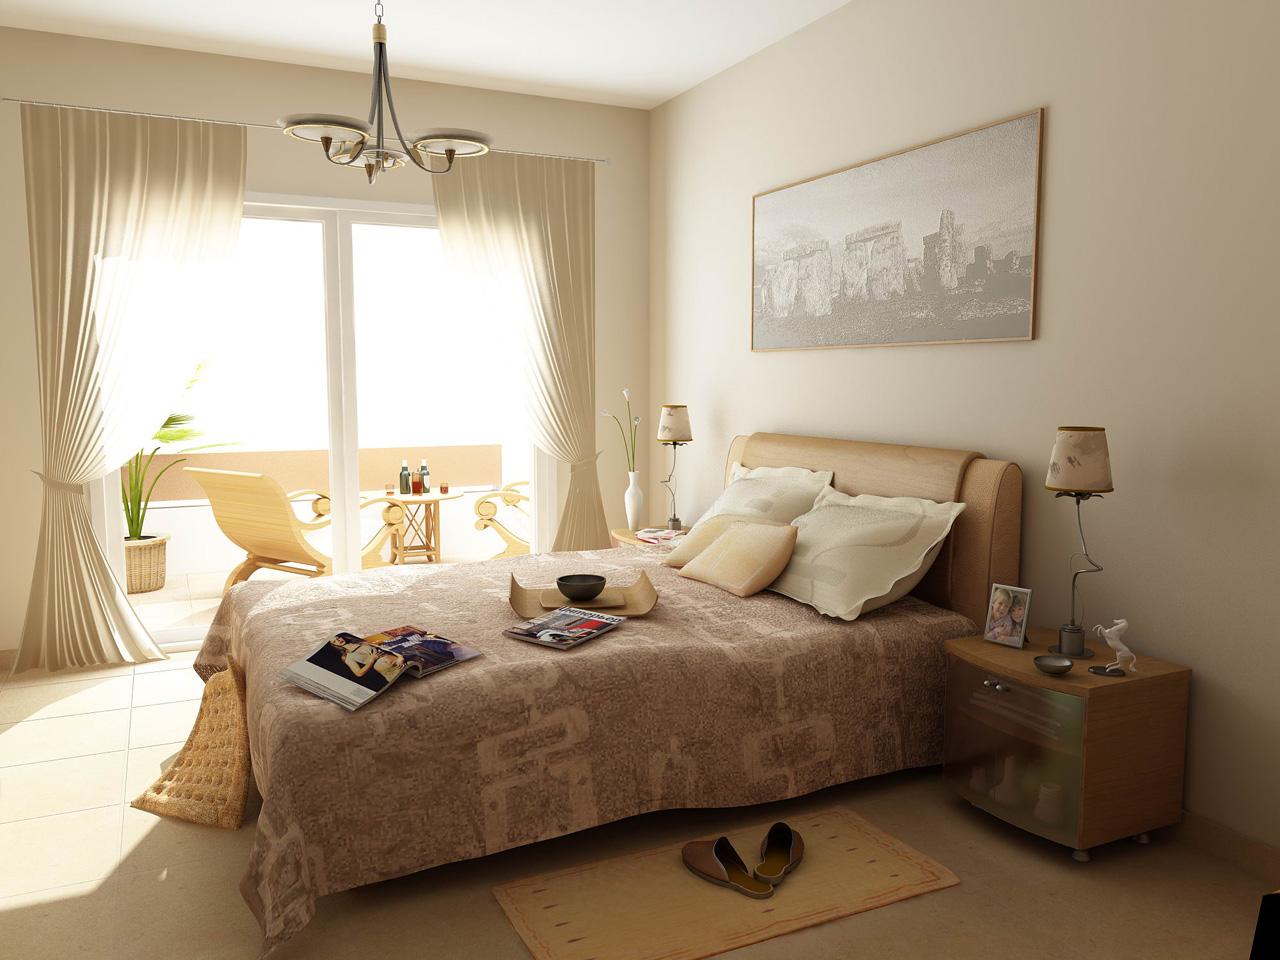 Home Interior Design & Decor: Amazing Bedrooms on Amazing Bedroom Ideas  id=72811